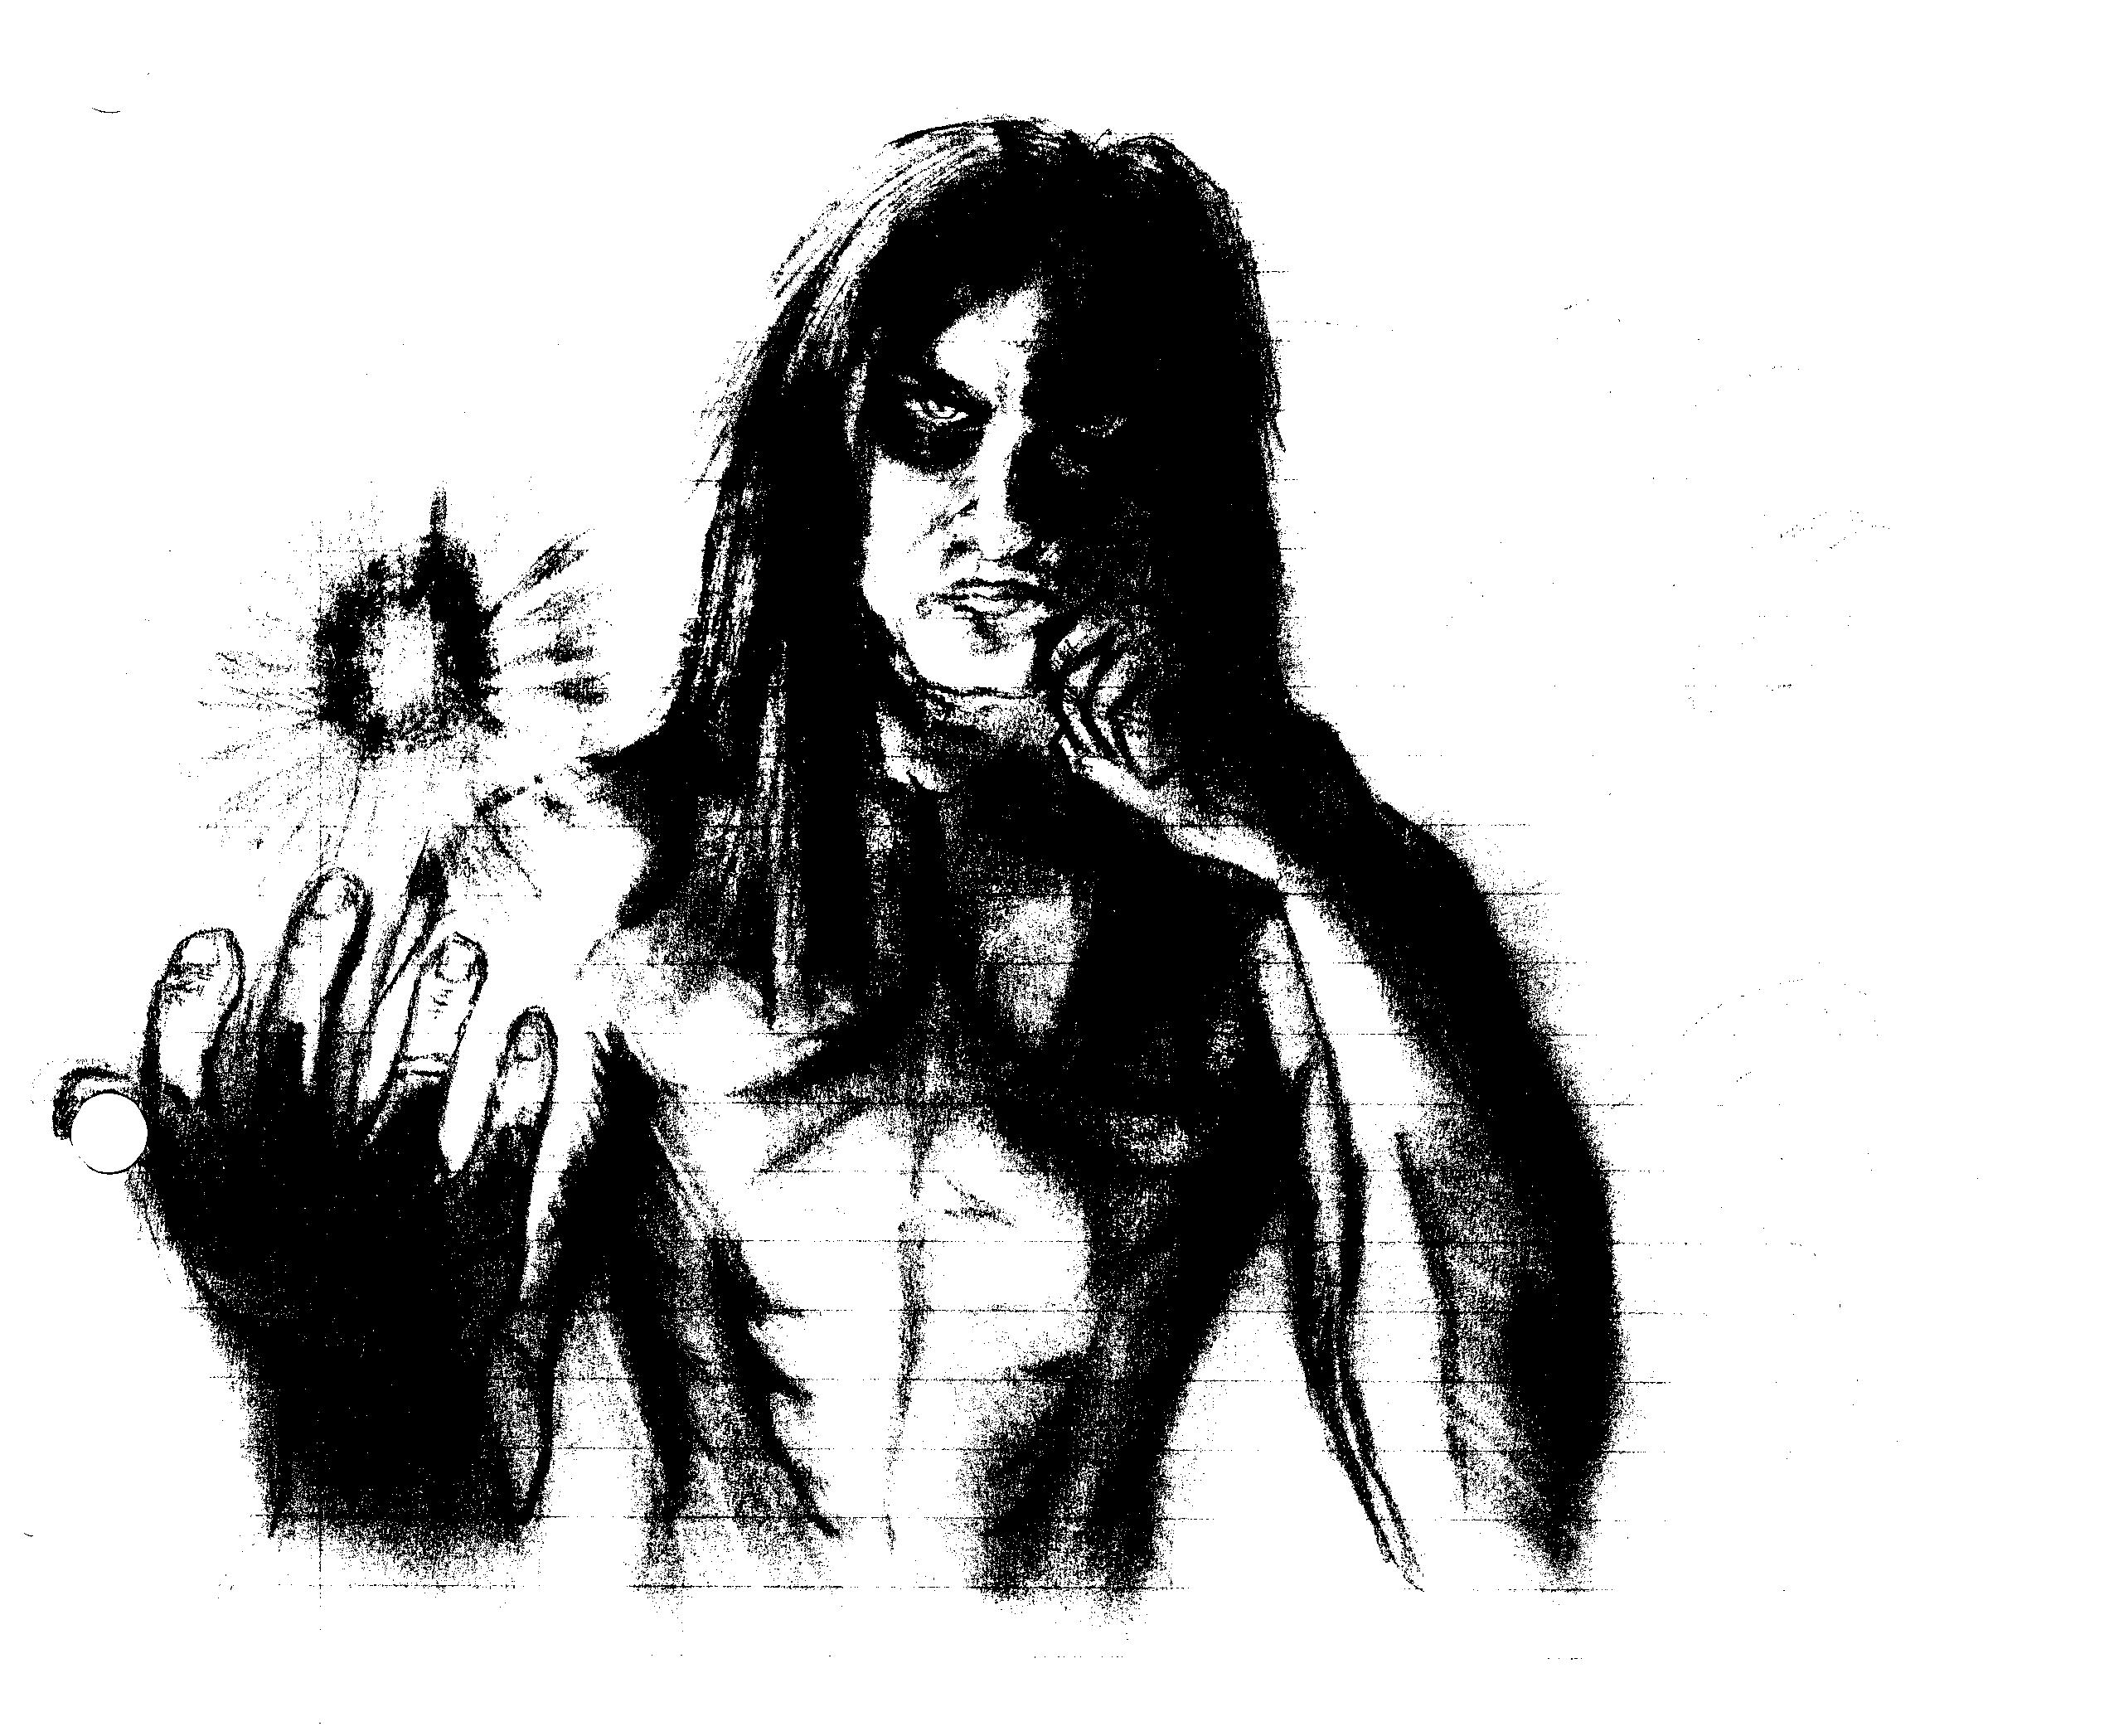 Fullmetal Alchemist Realistic Father by leelazarecky